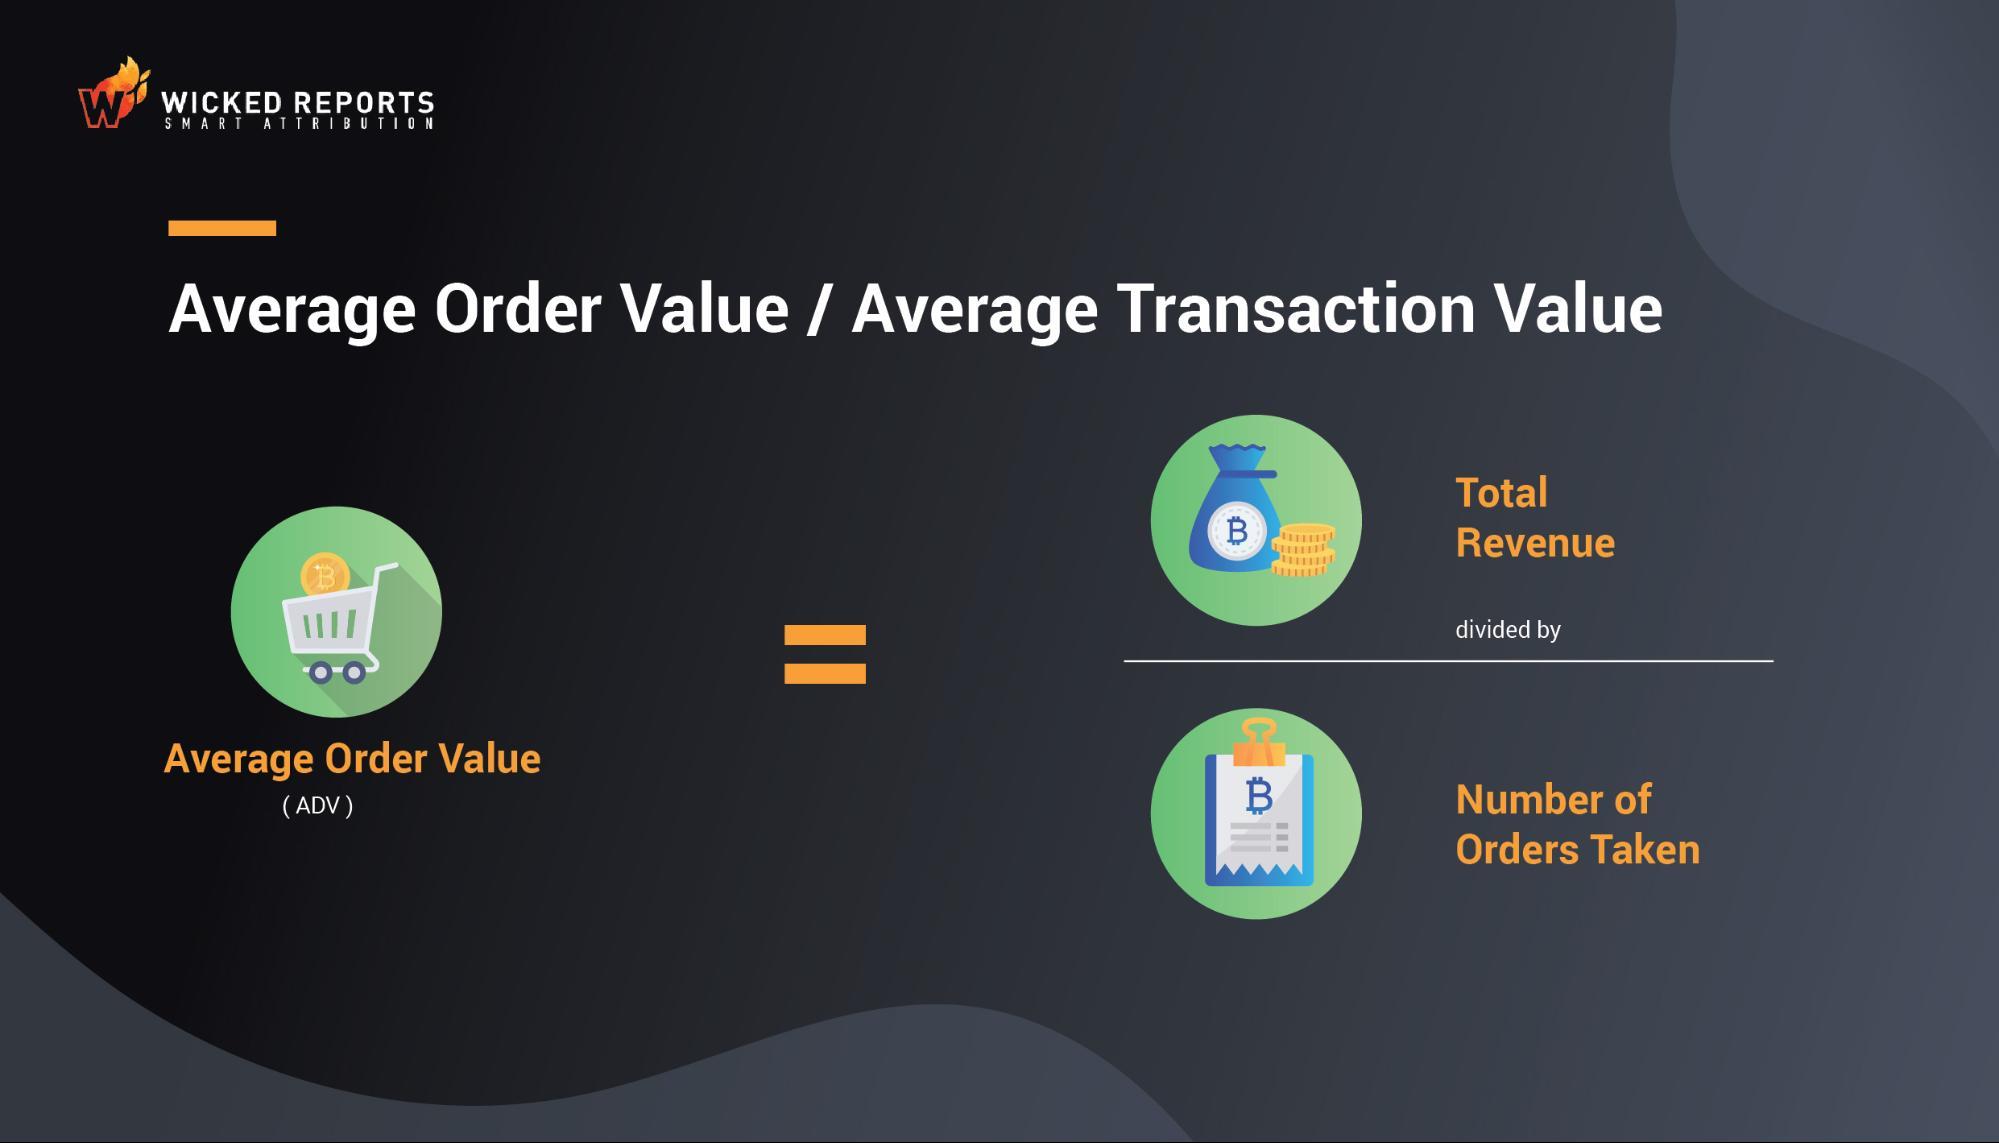 average order value or average transaction value